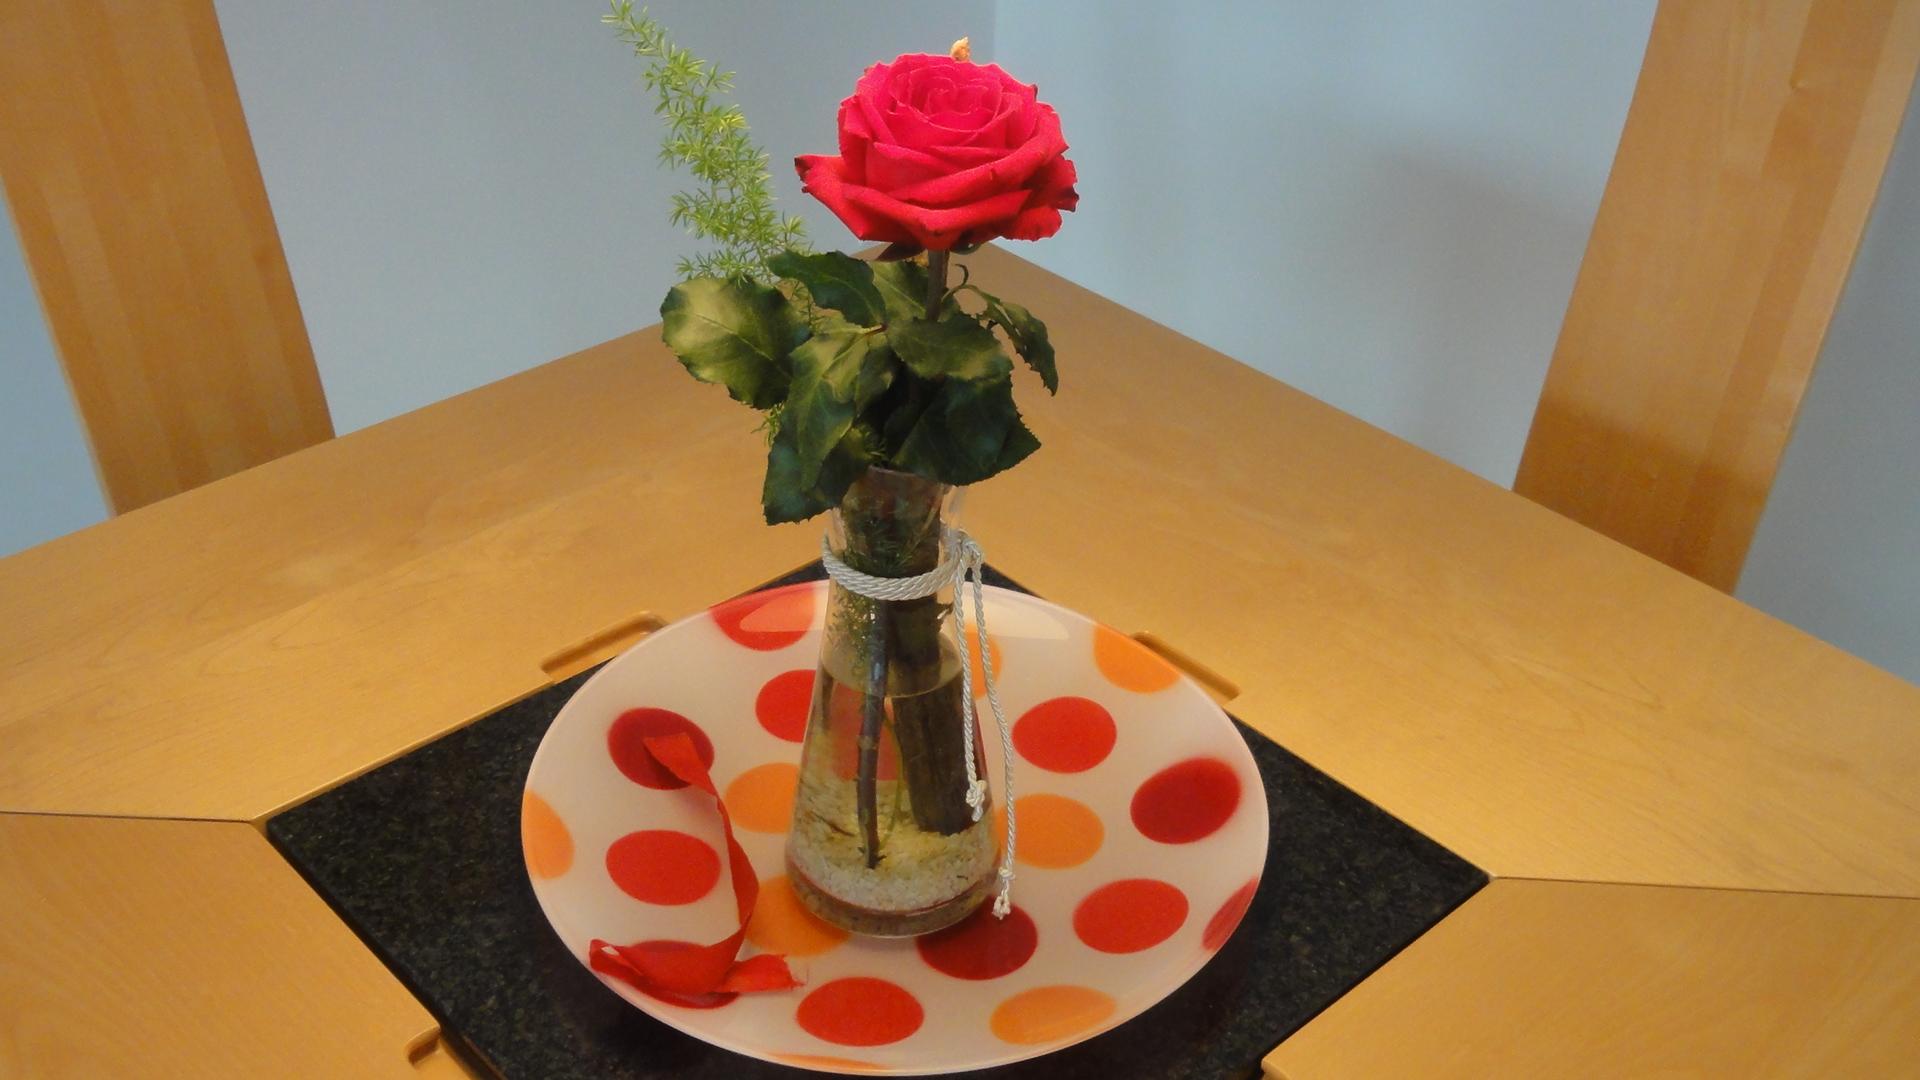 Rose in stilvollem Ambiente